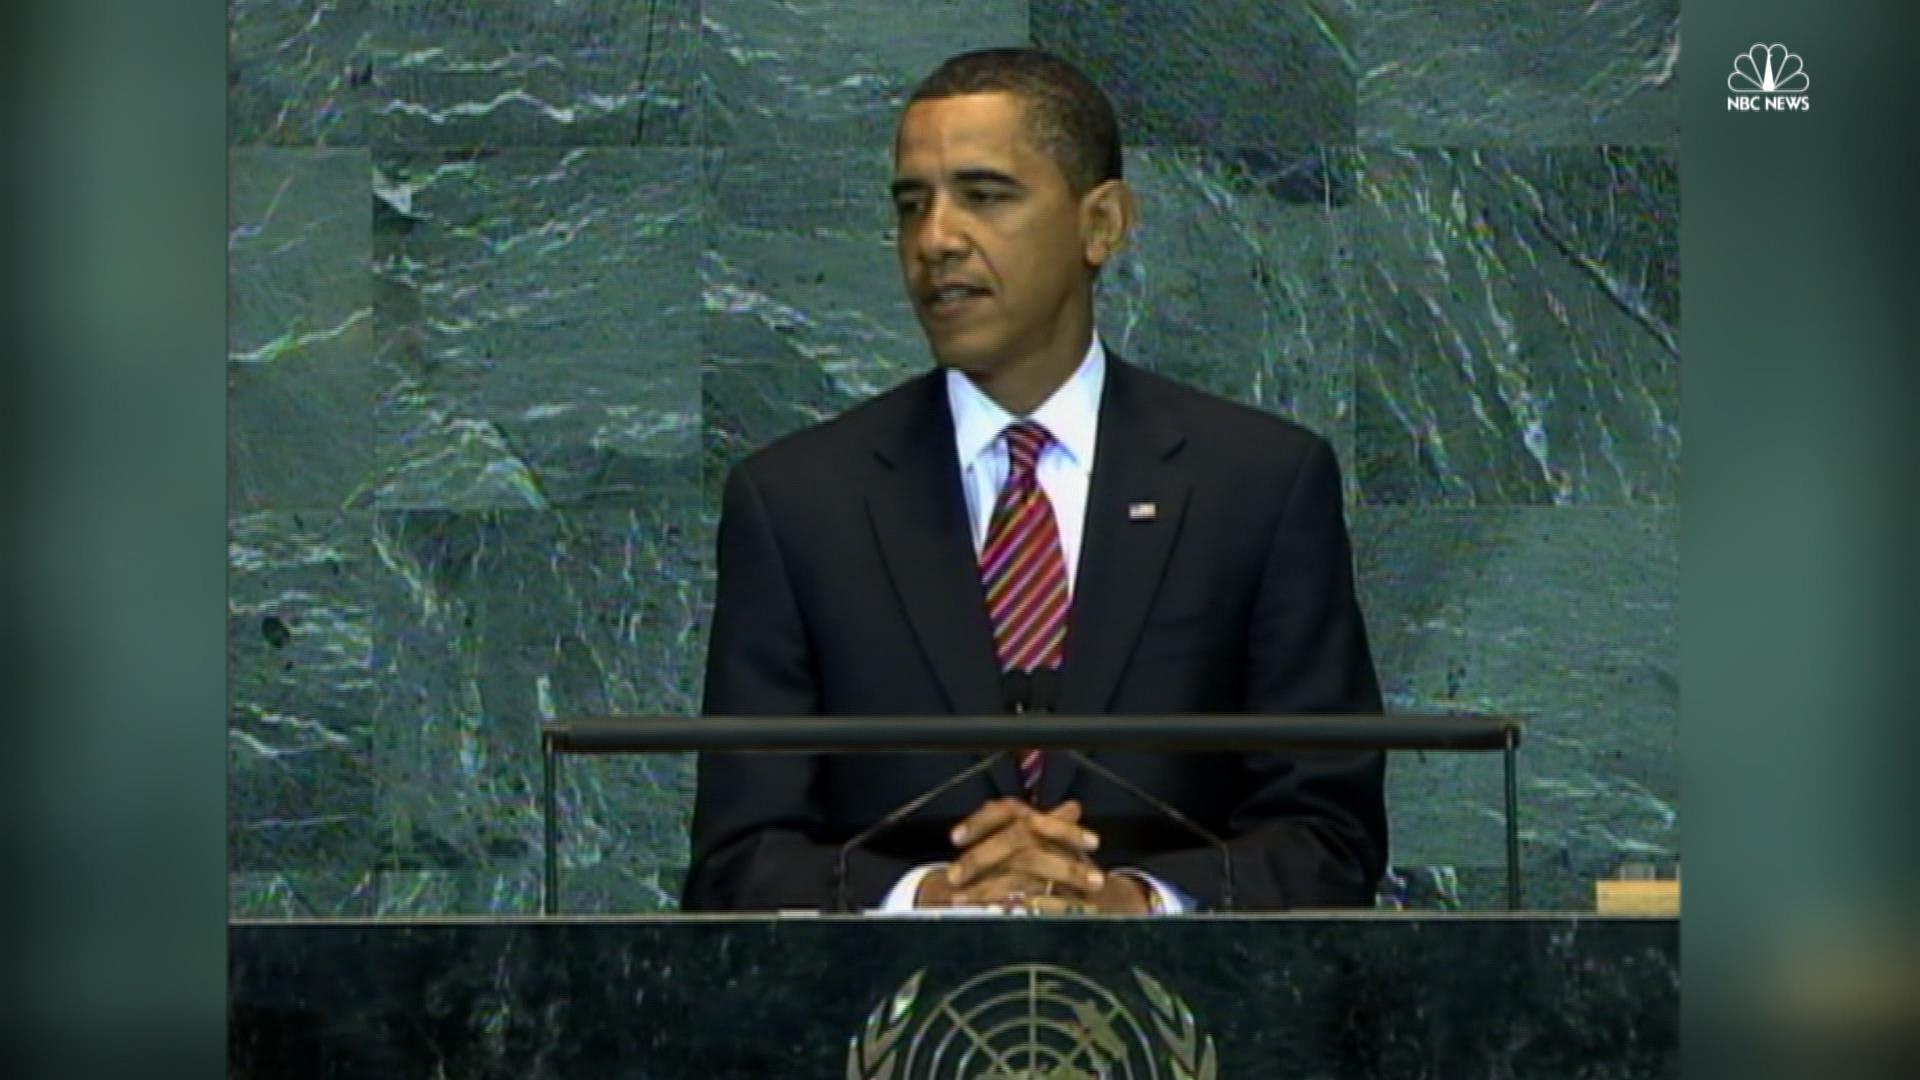 Watch Obama's first speech at UN